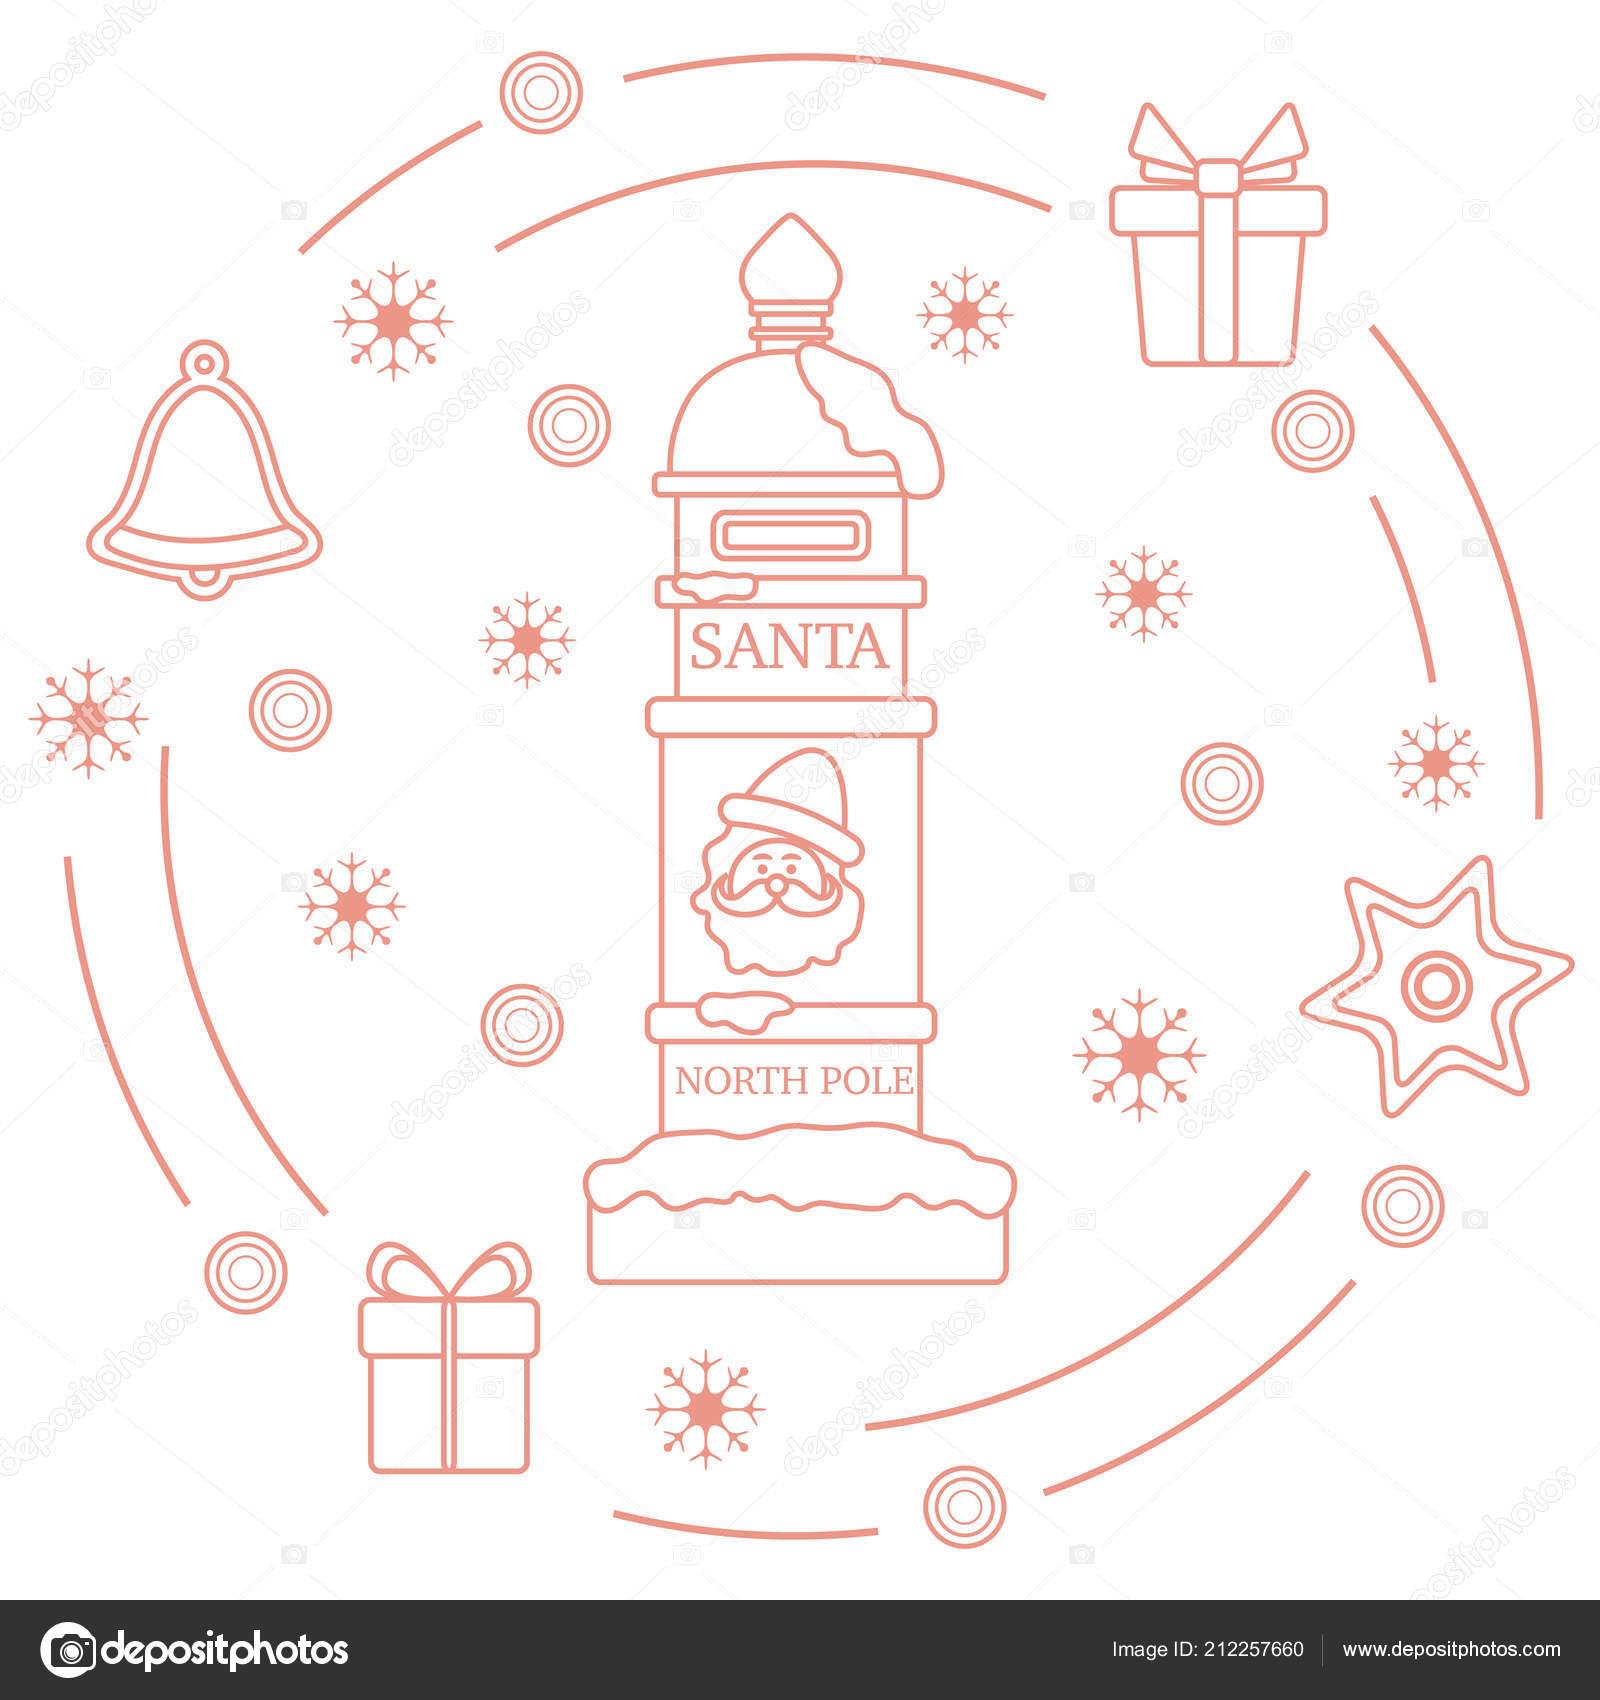 Santa Mailbox Gifts Bell Gingerbread Star Snowflakes New Year